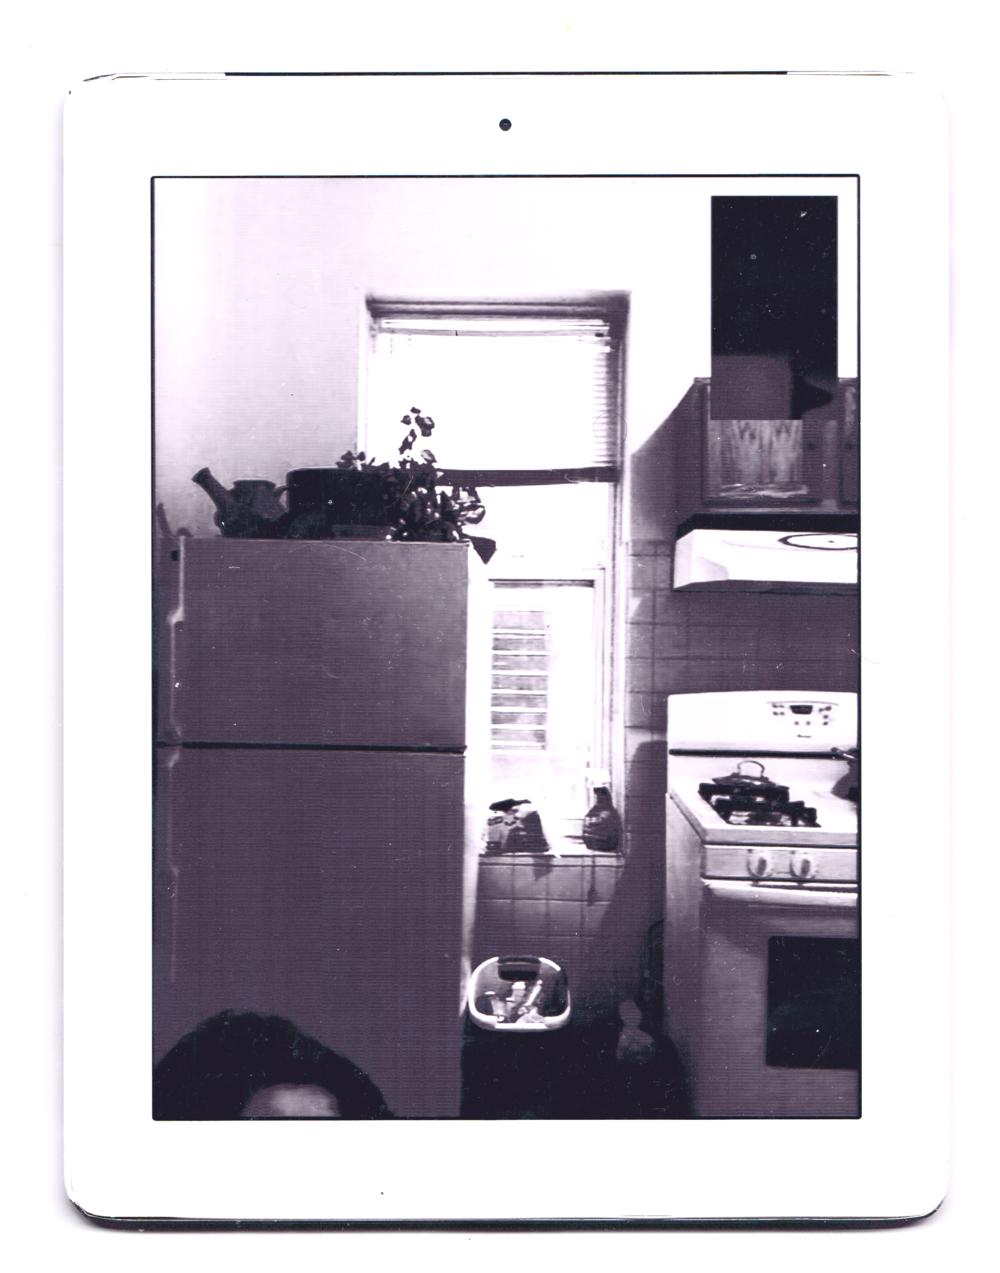 Kitchen_02 copy copy.png